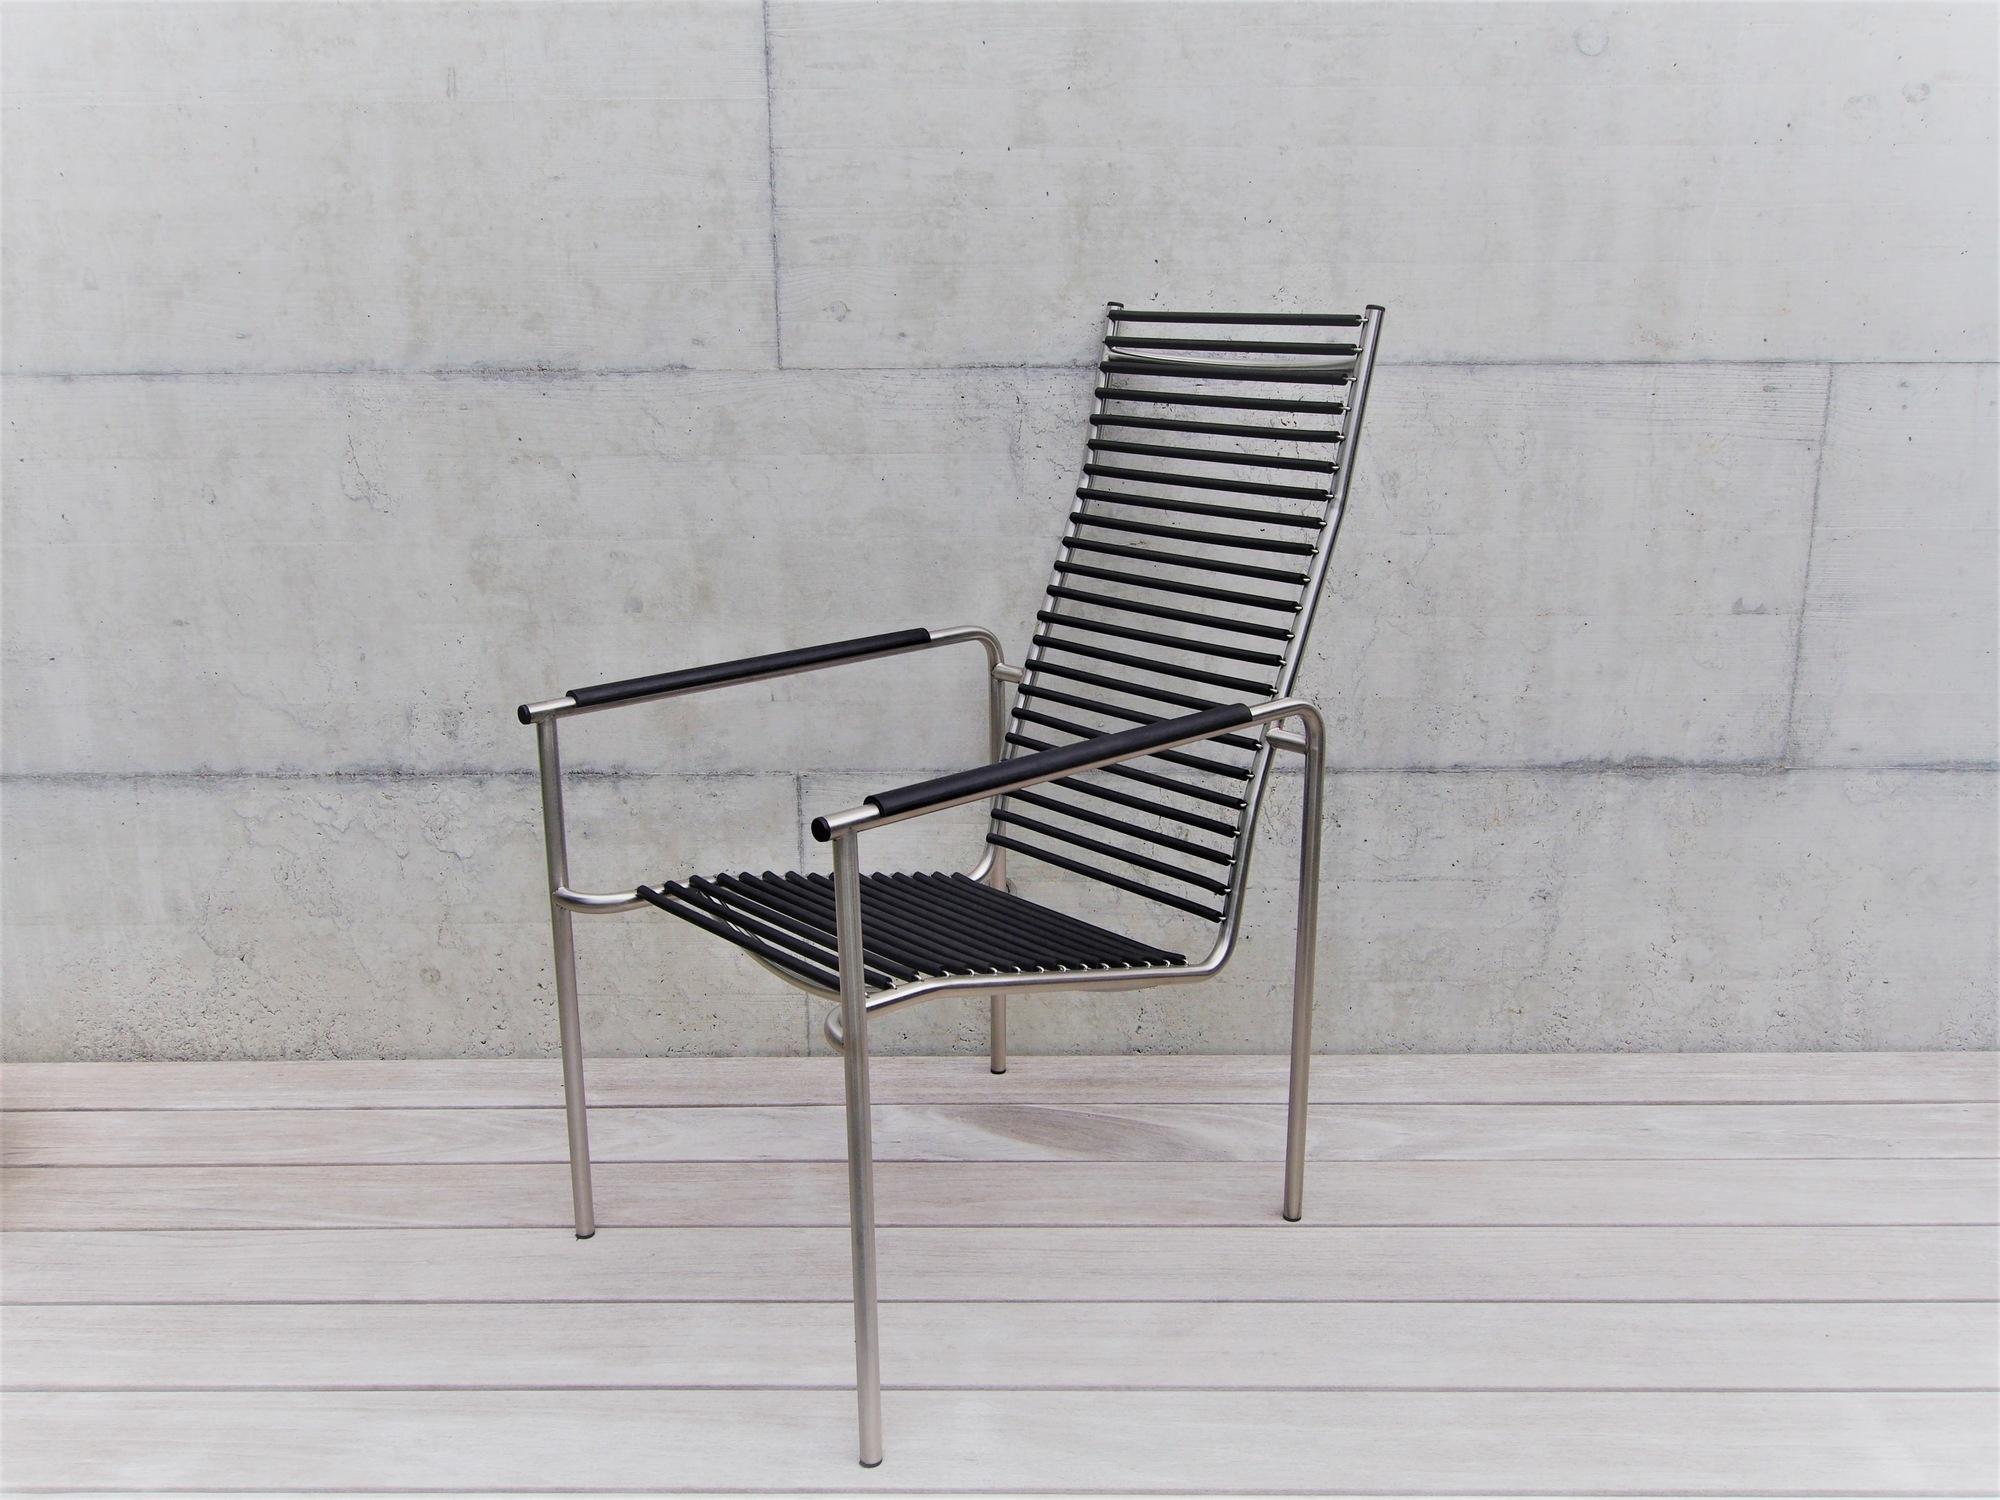 1531834168-gartenmoebel-clone-fauteuil-julia.jpg